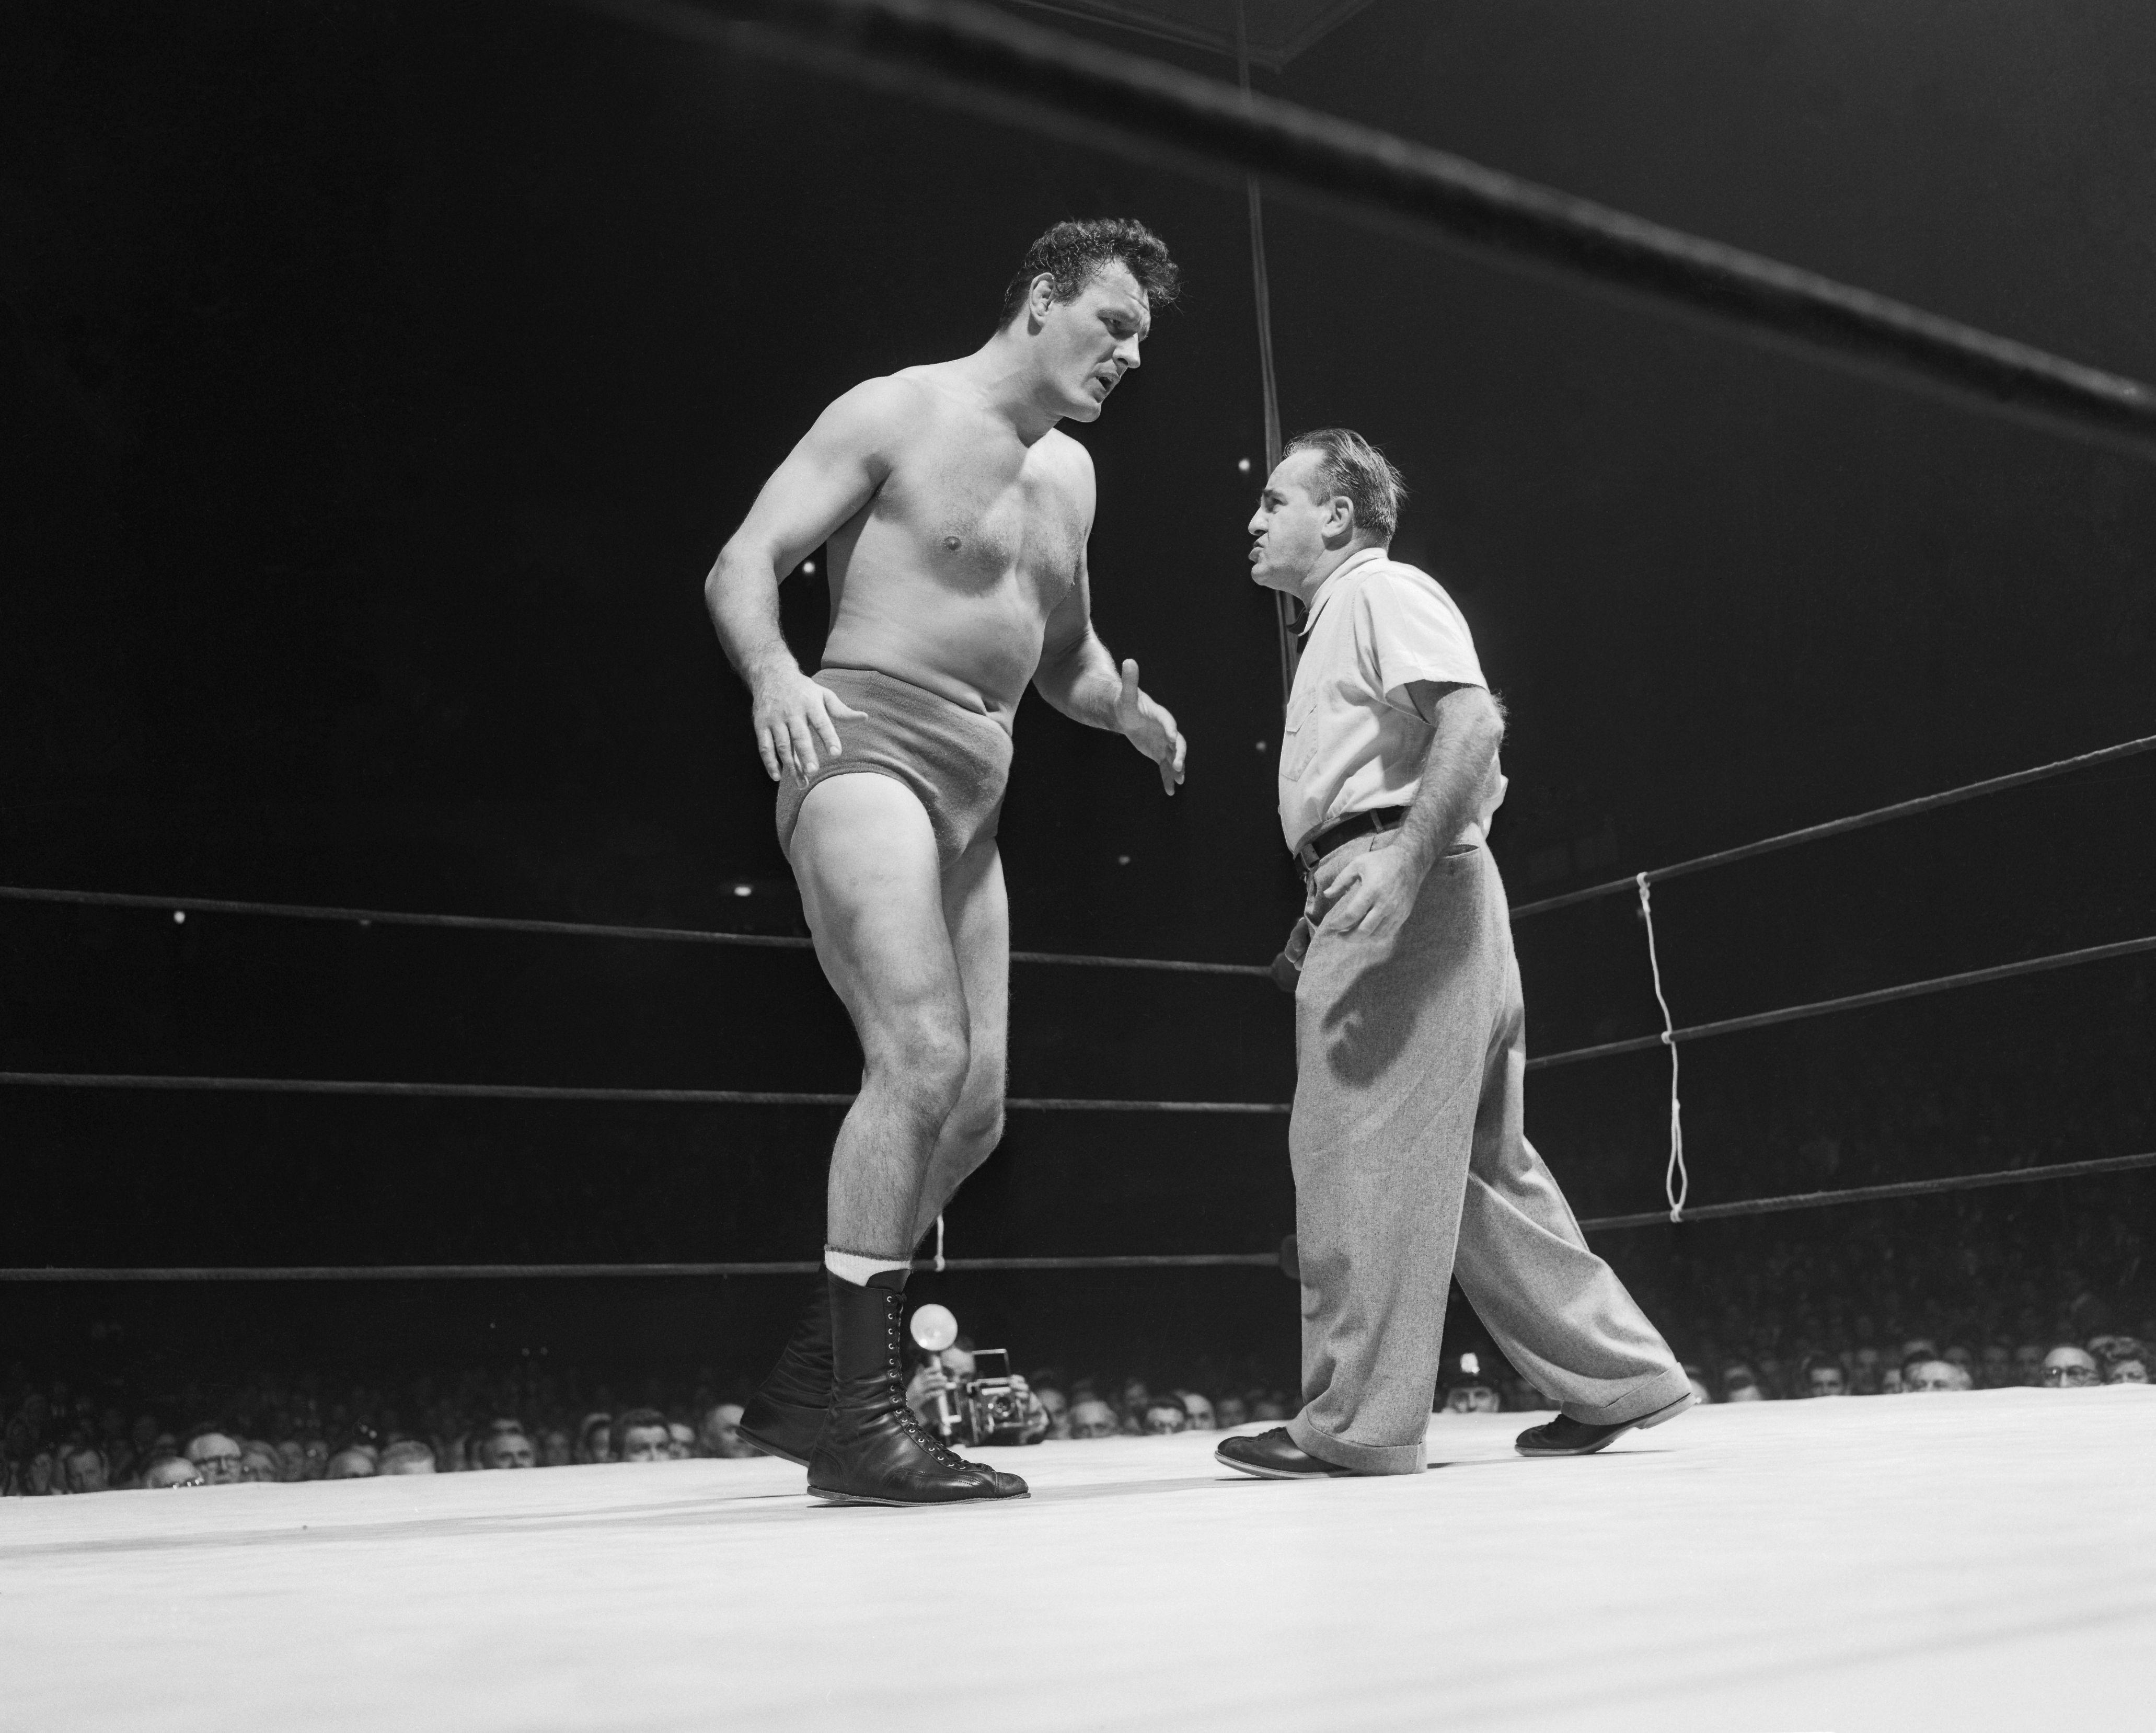 Referee Warning Wladek 'Killer' Kowalski on Wrestling